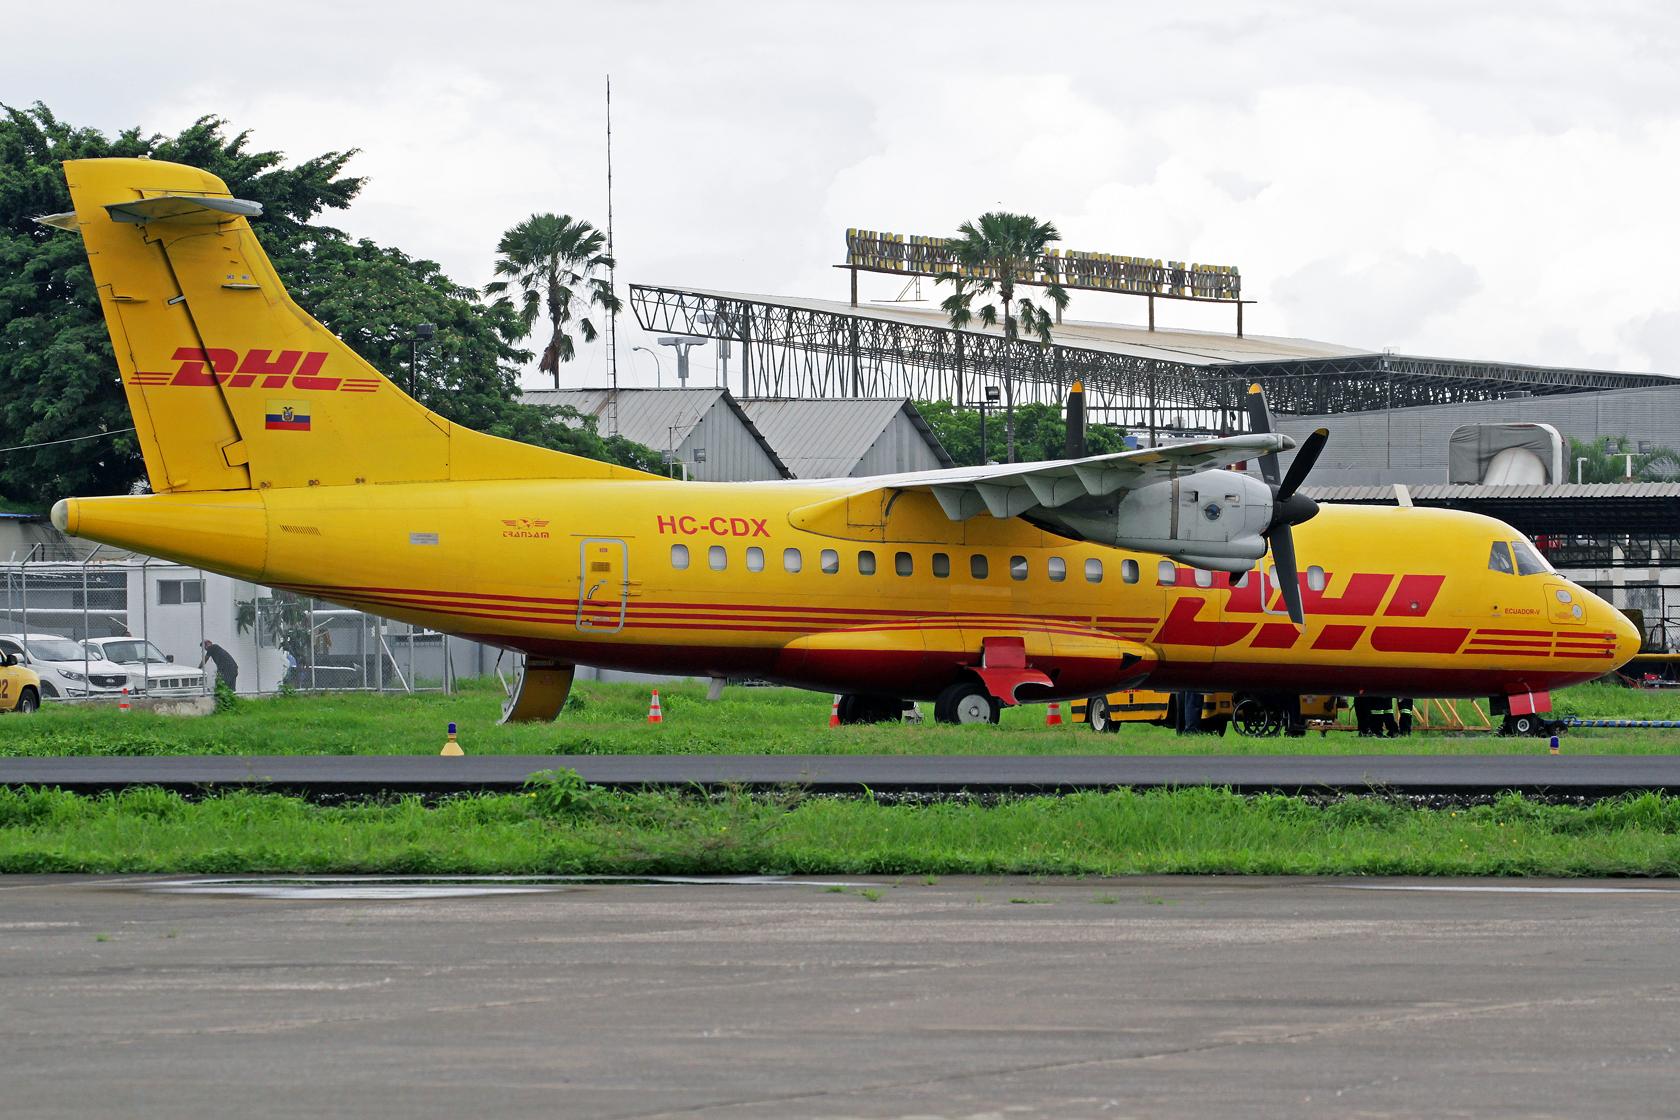 Trans Am Aero Express del Ecuador (DHL Ecuador) ATR 42-320(F) HC-CDX